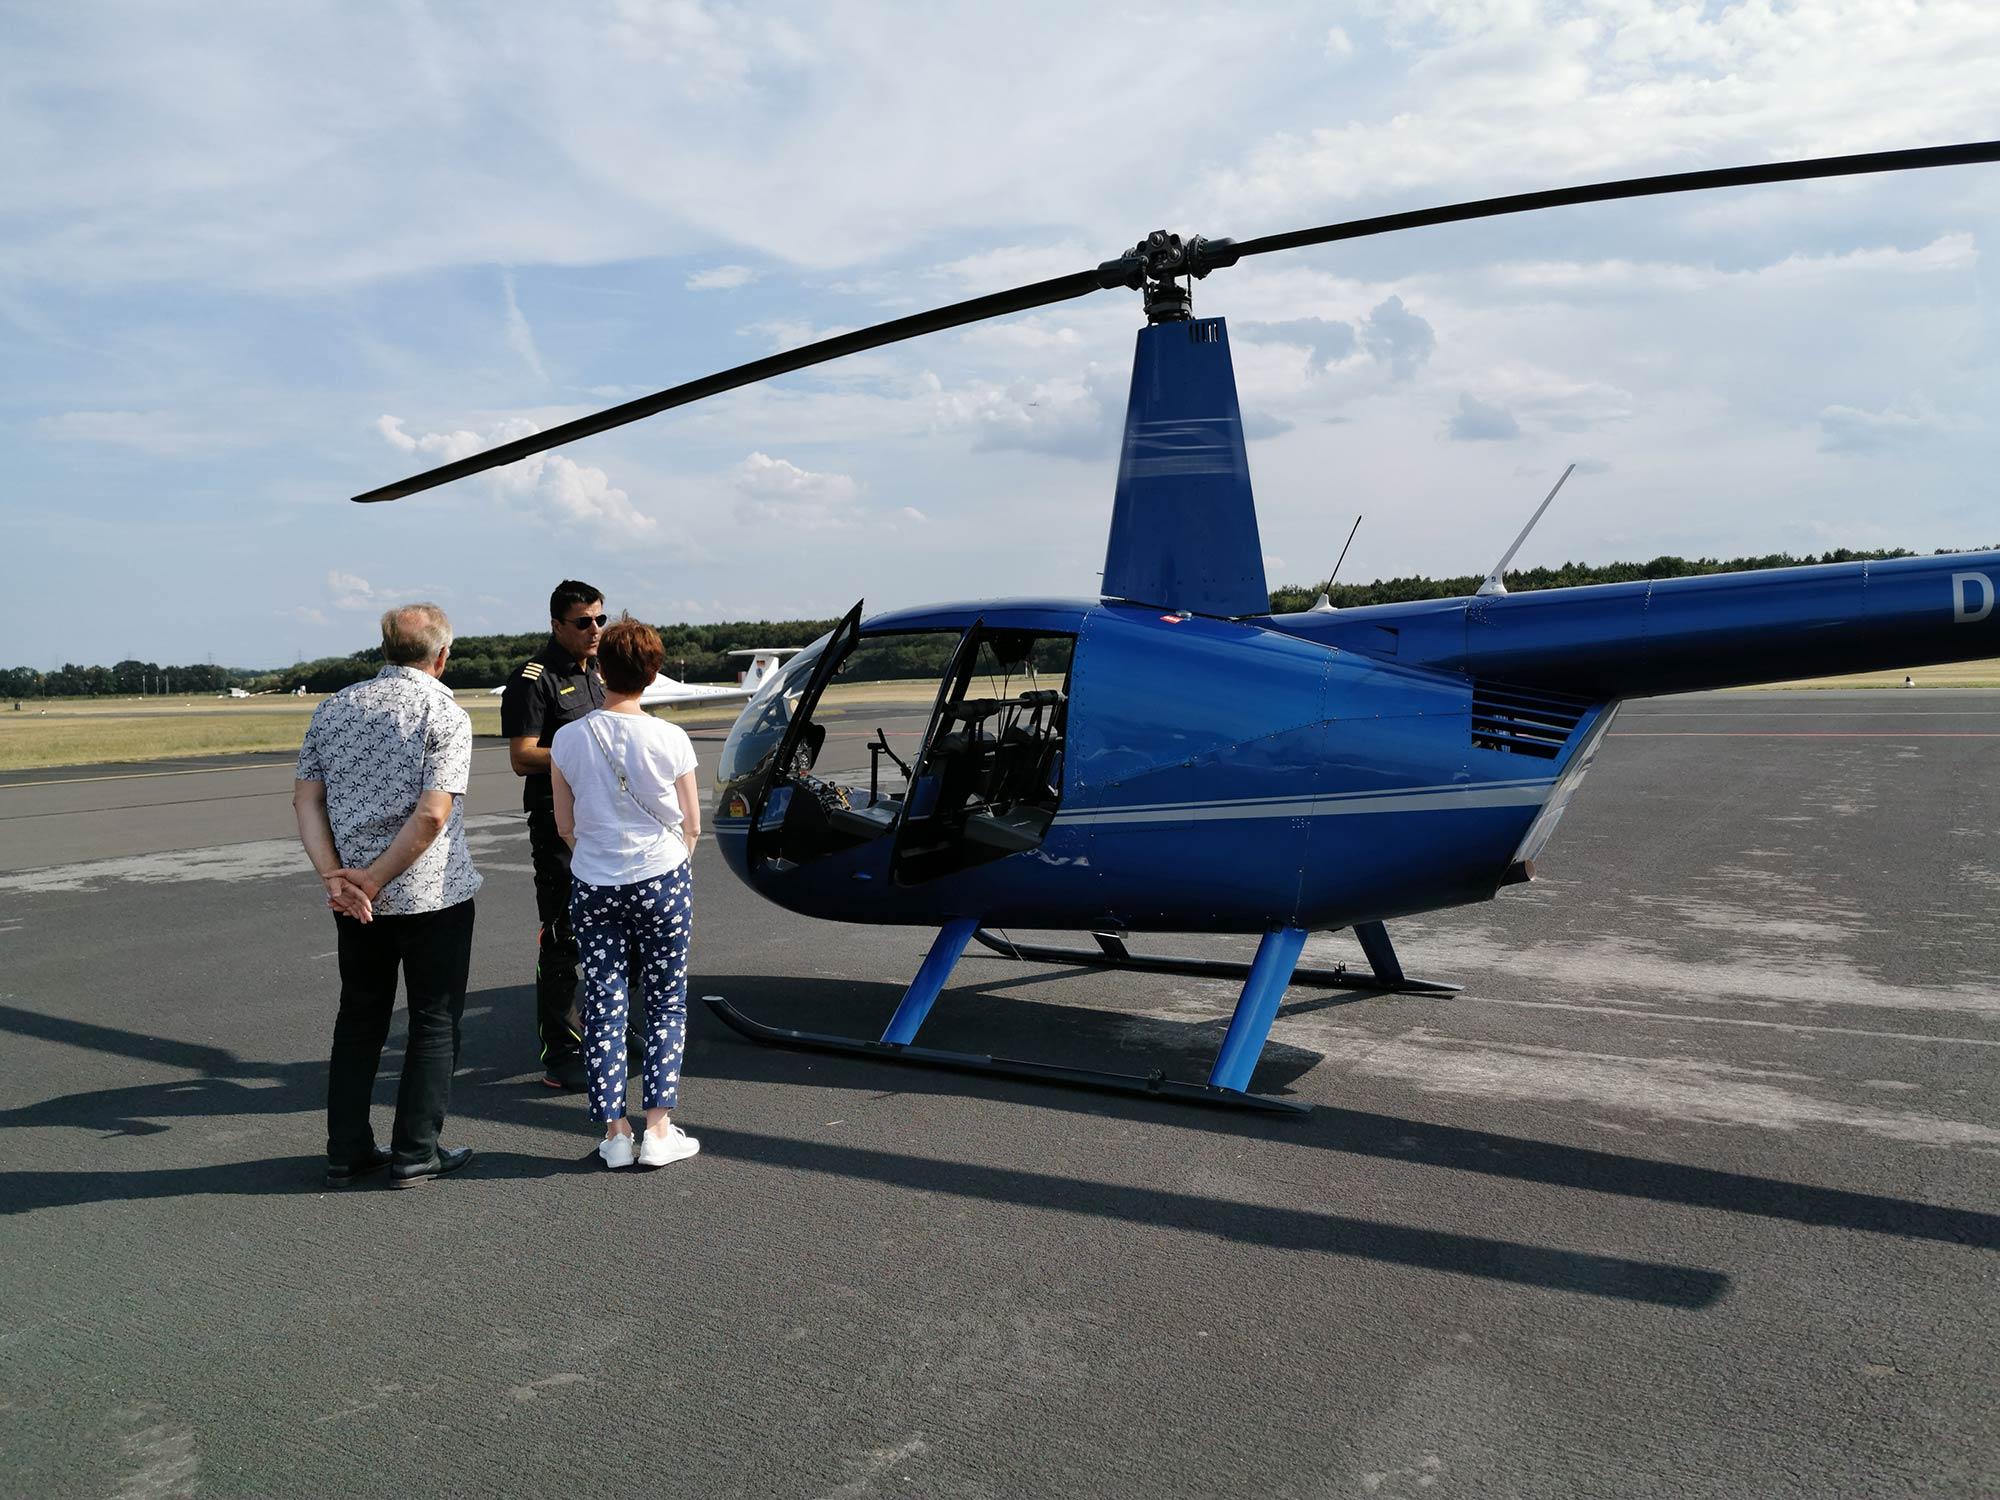 Helikopter Flug Frankfurt günstig mit Helifliegen.de - Pilot informiert Fluggäste über den Heliflug zur Frankfurter Skyline